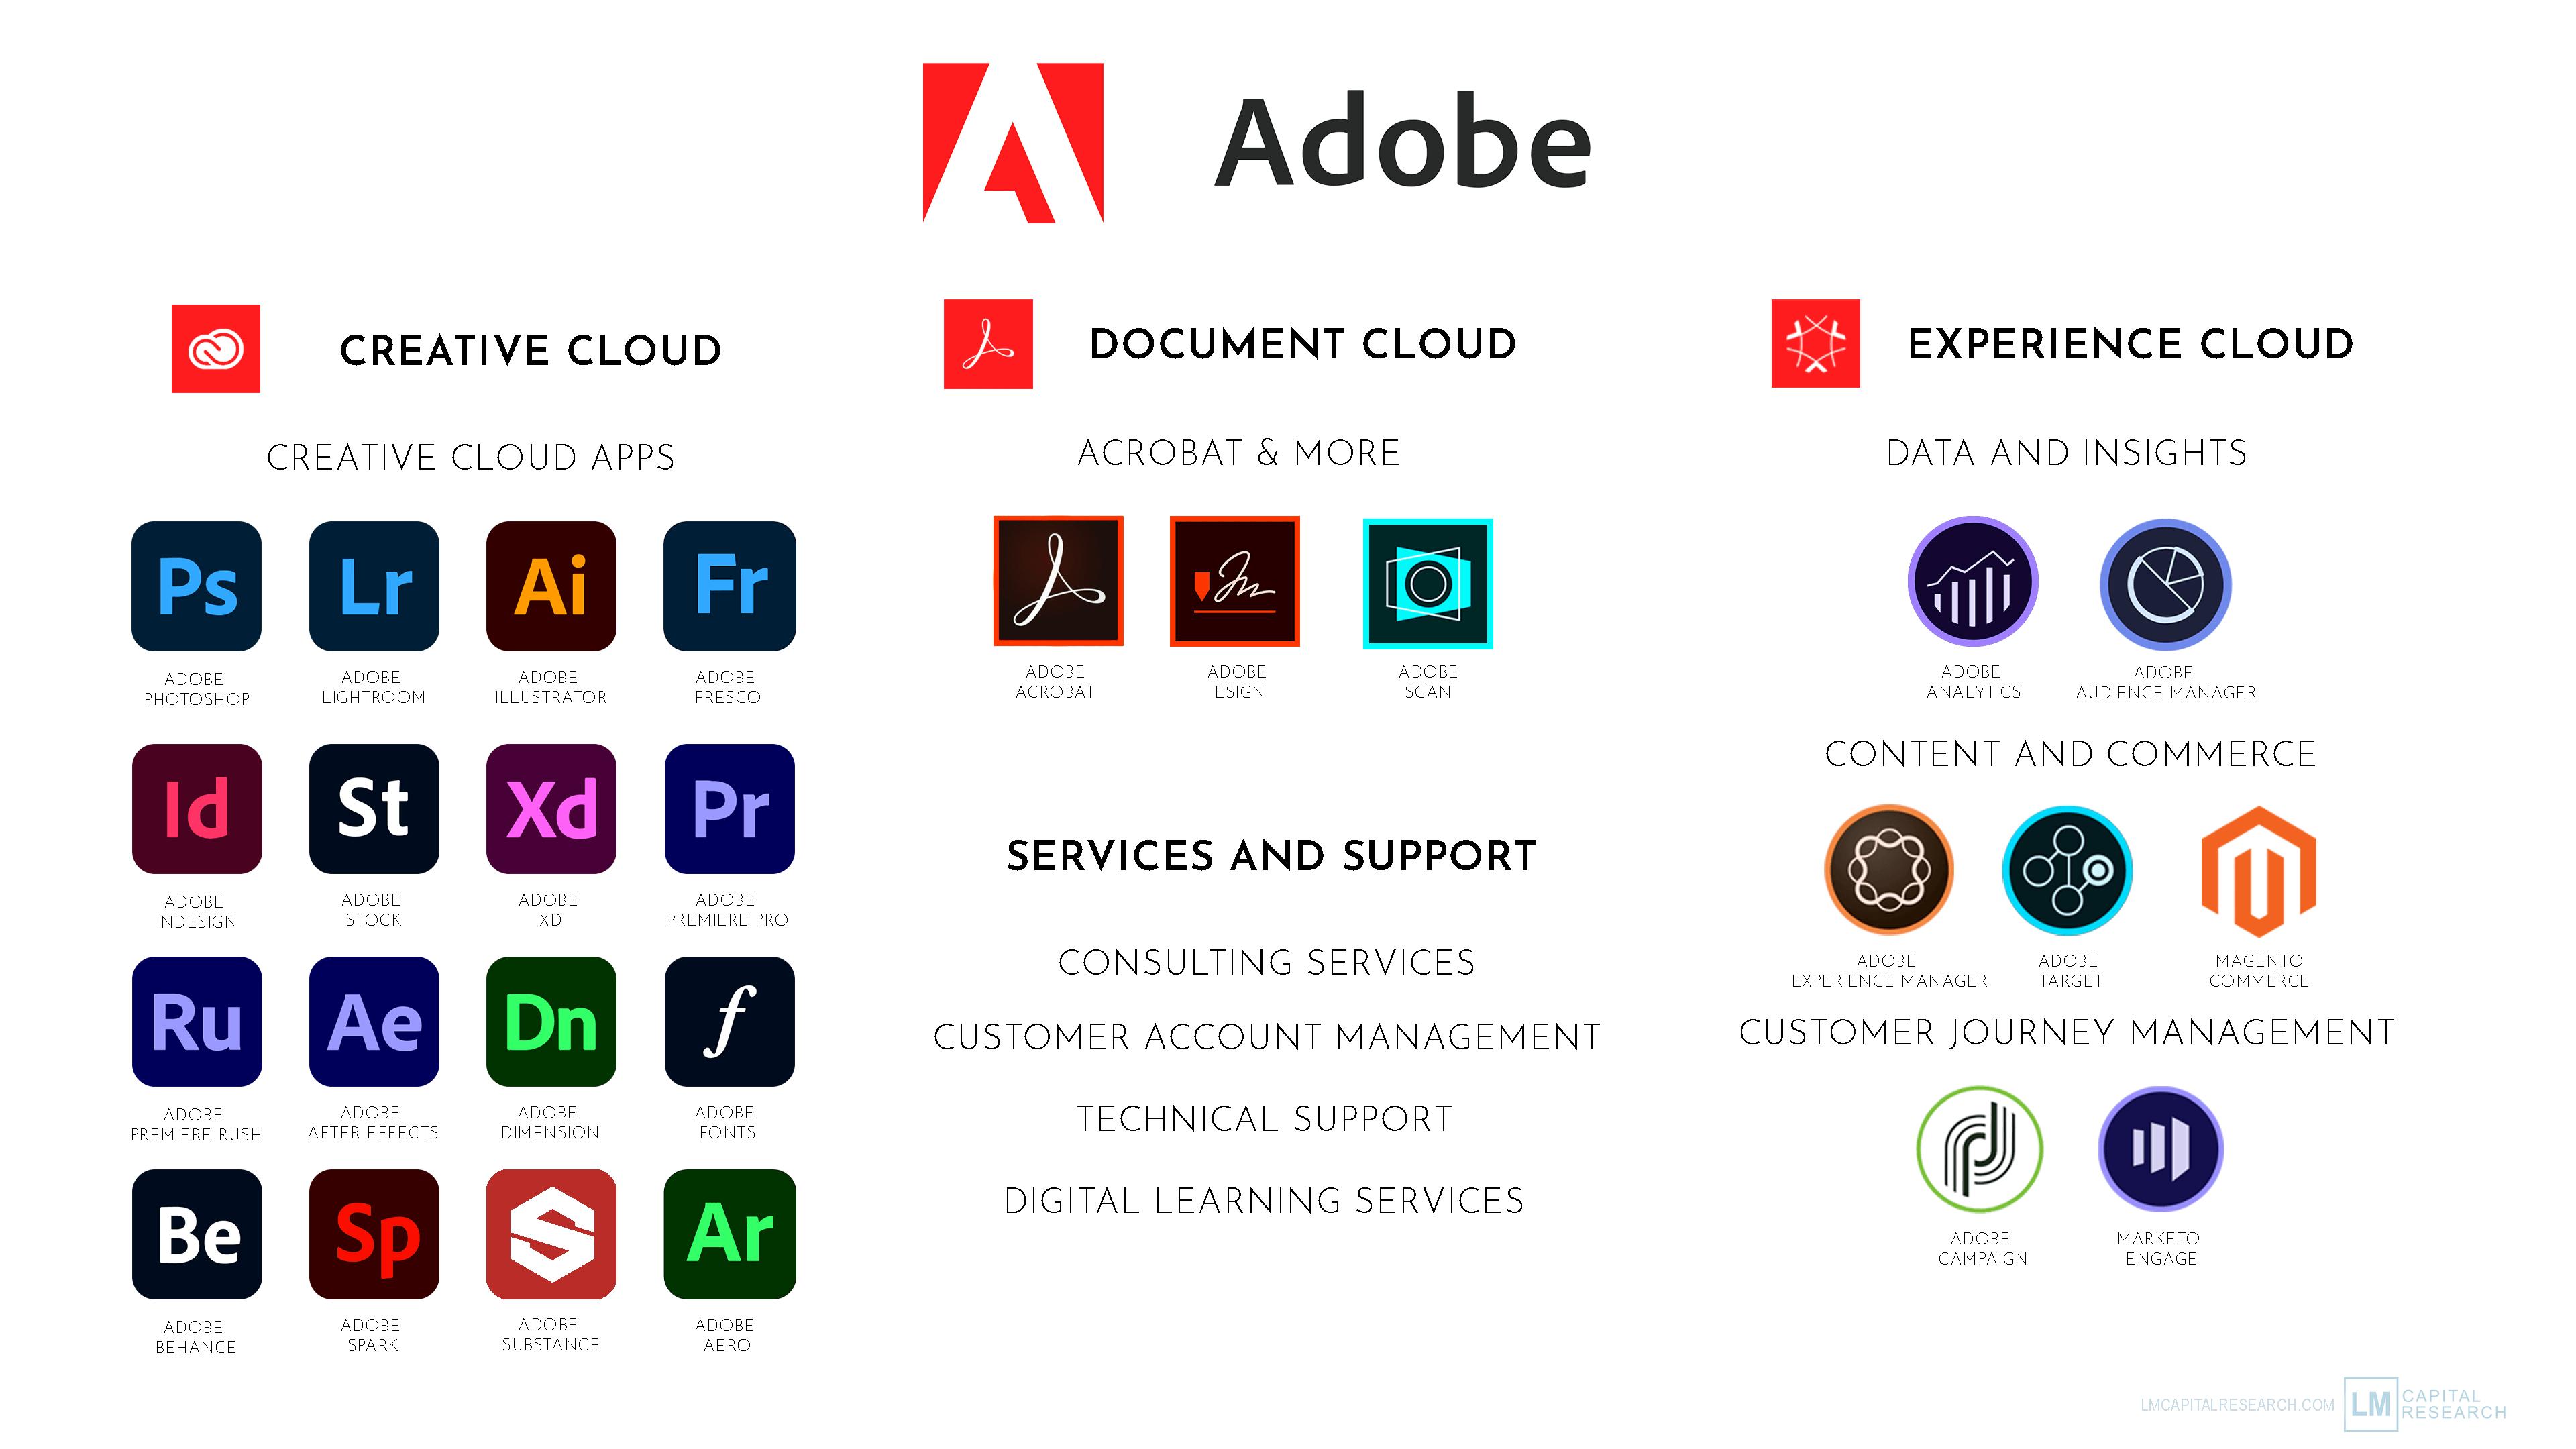 Adobe: Continued Strong Revenue Growth Will Power Adobe For The Next Decade  (NASDAQ:ADBE) | Seeking Alpha